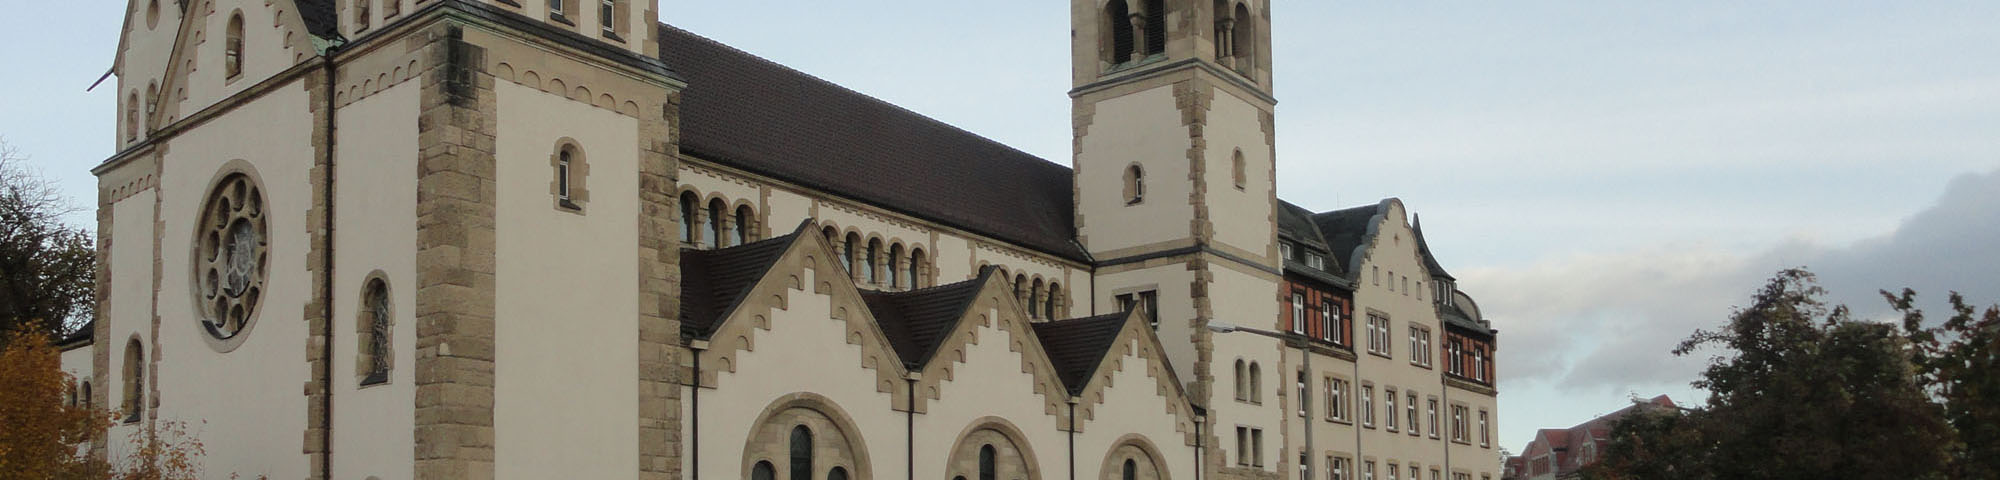 Kath. Liebfrauenkirche Lindenau